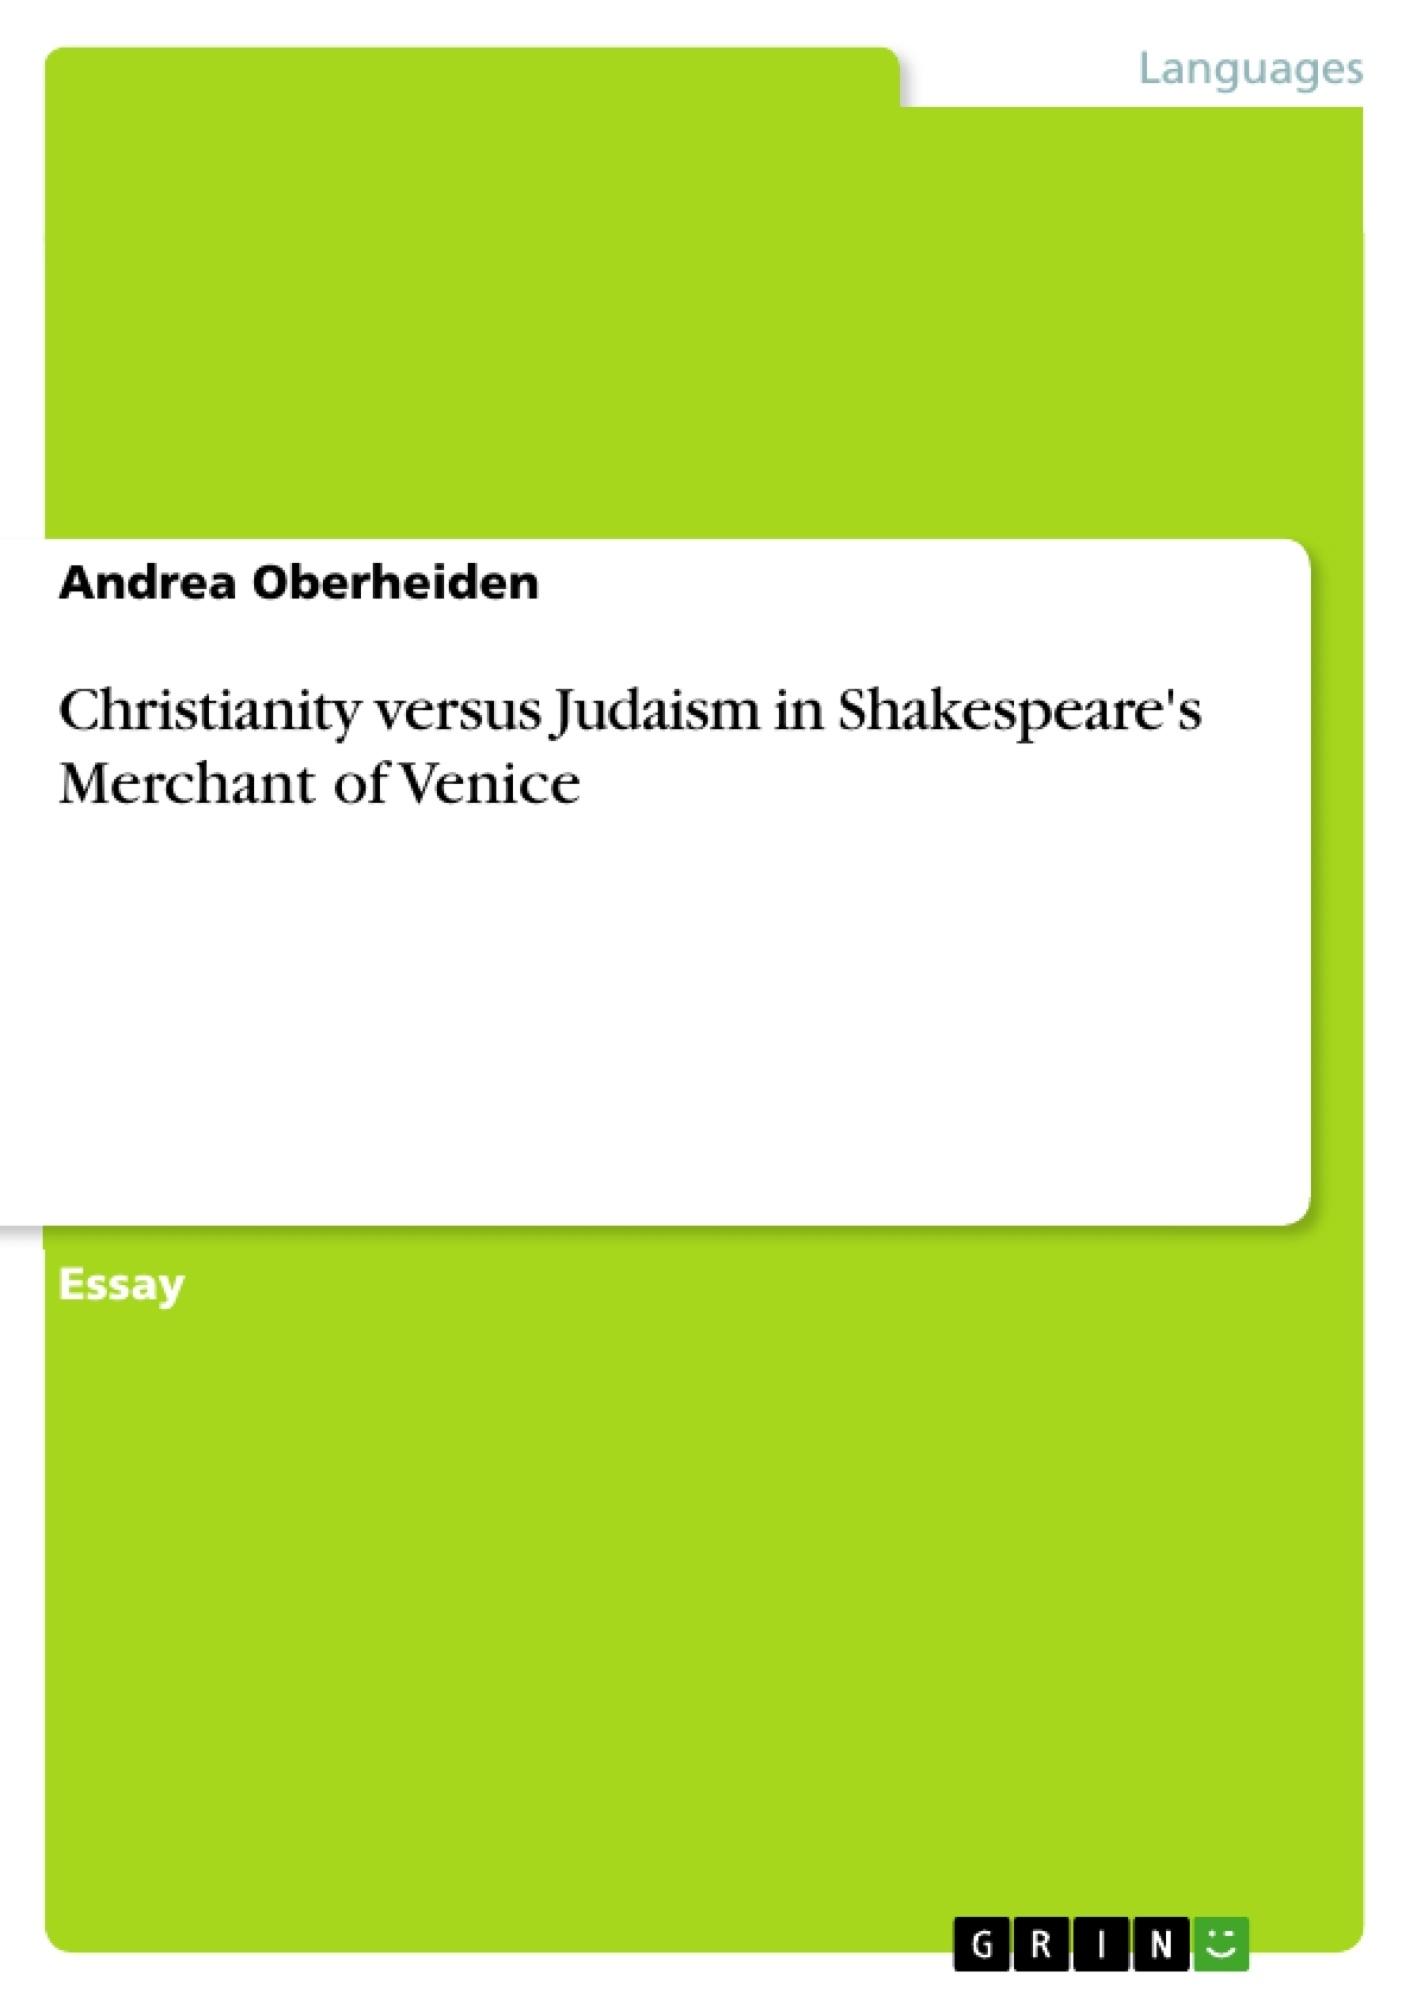 Title: Christianity versus Judaism in Shakespeare's Merchant of Venice